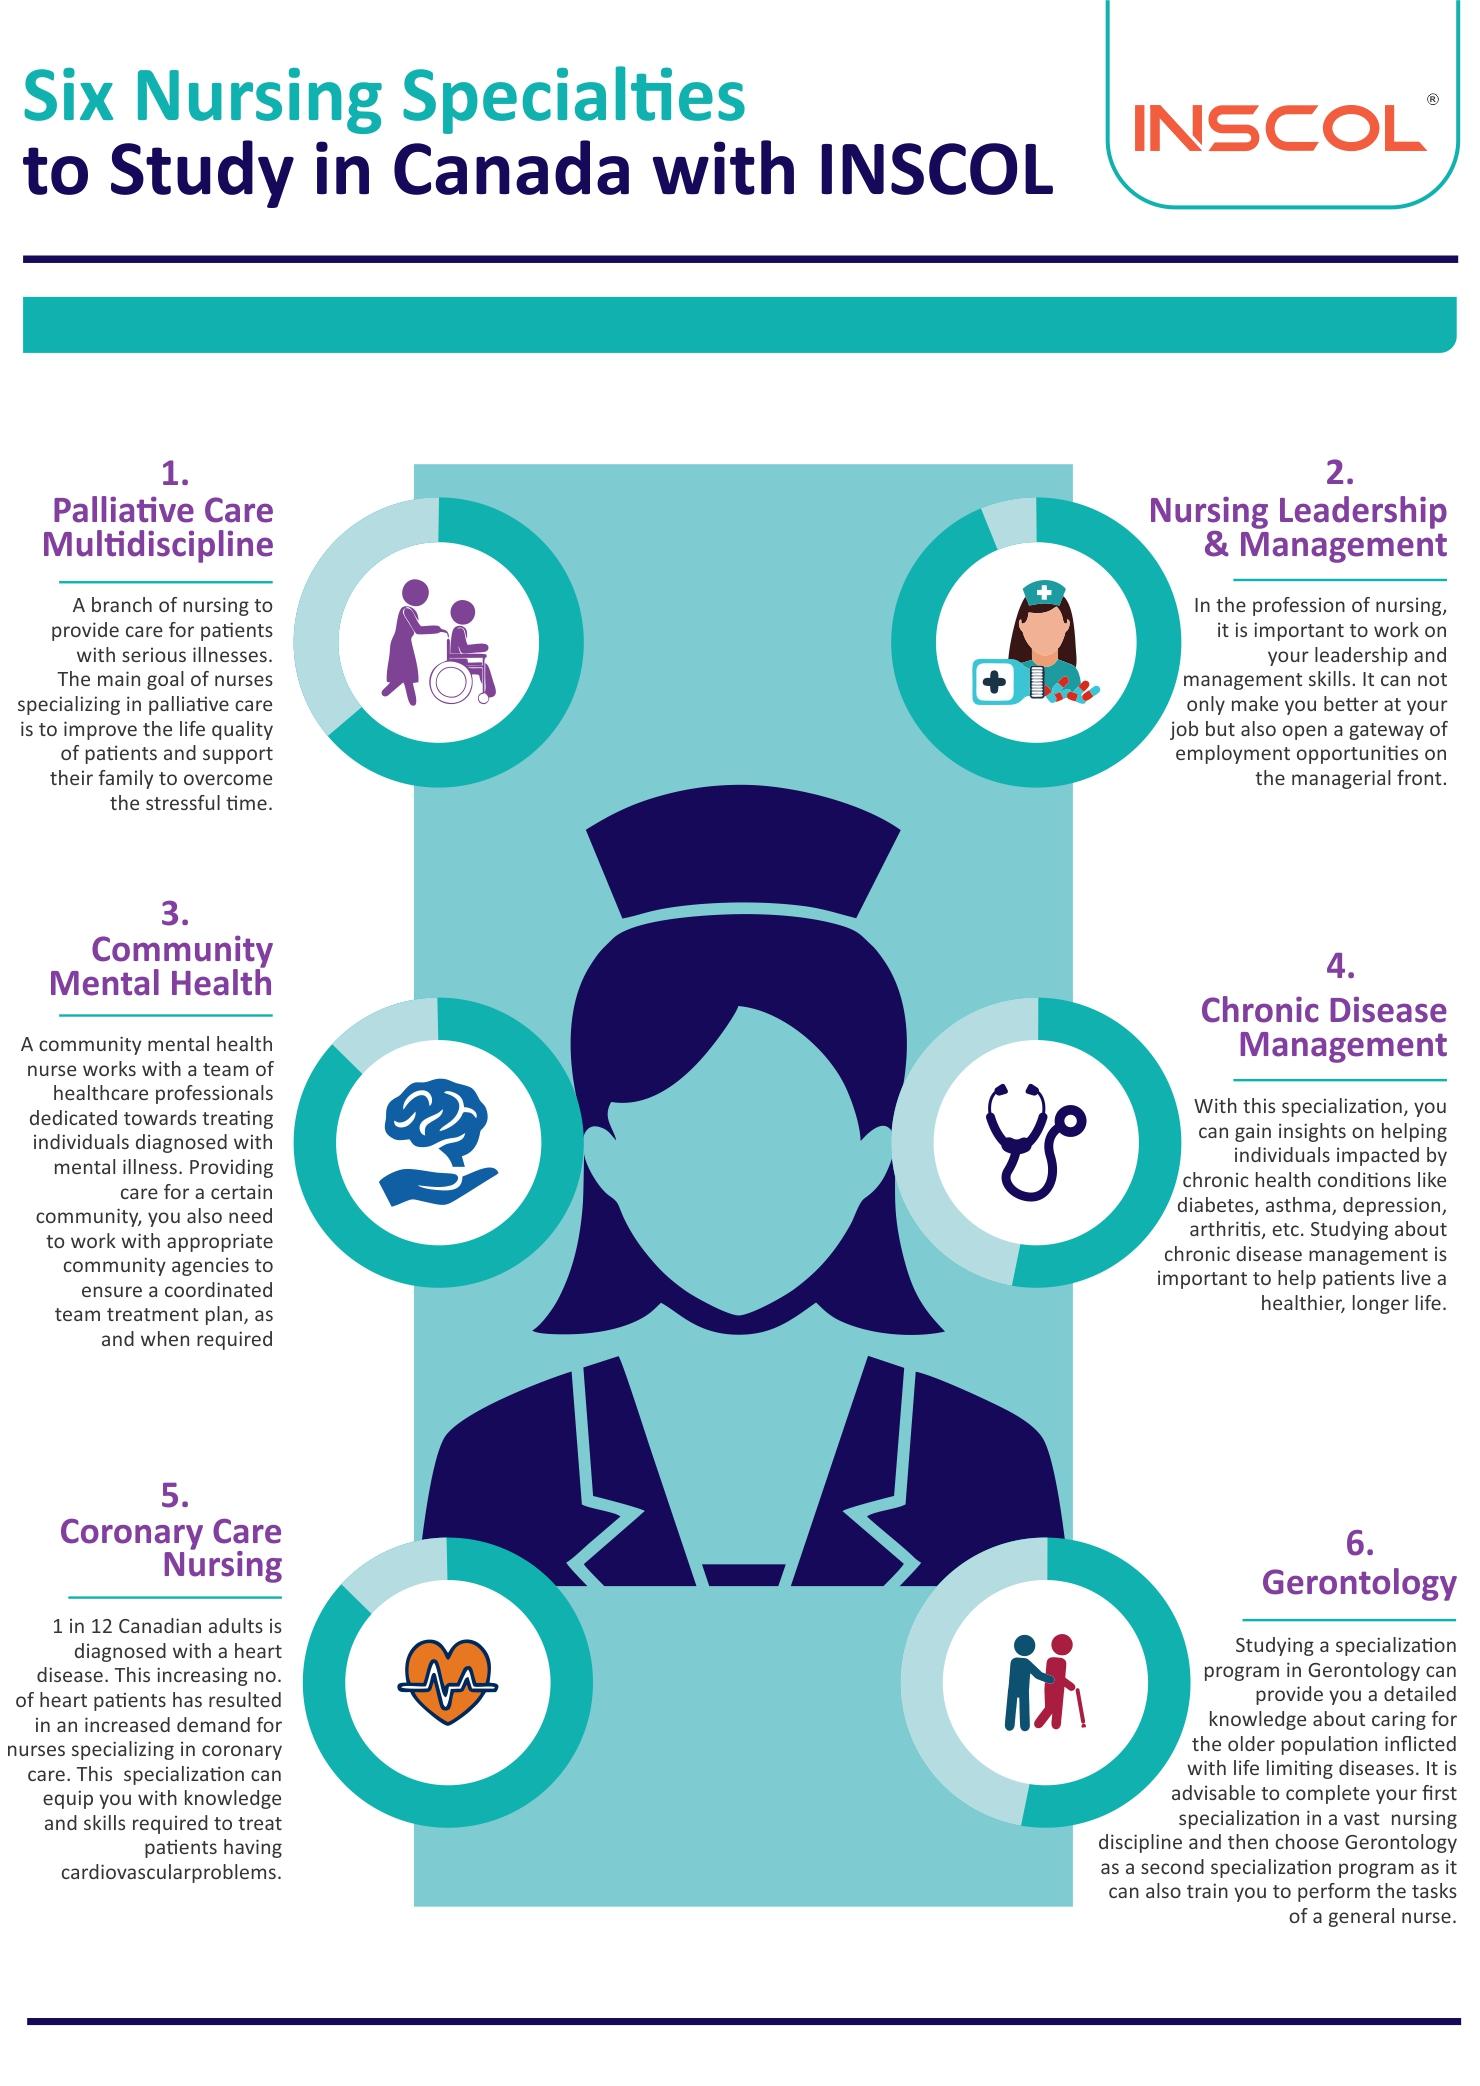 Six Nursing Specialties You Must Study in Canada